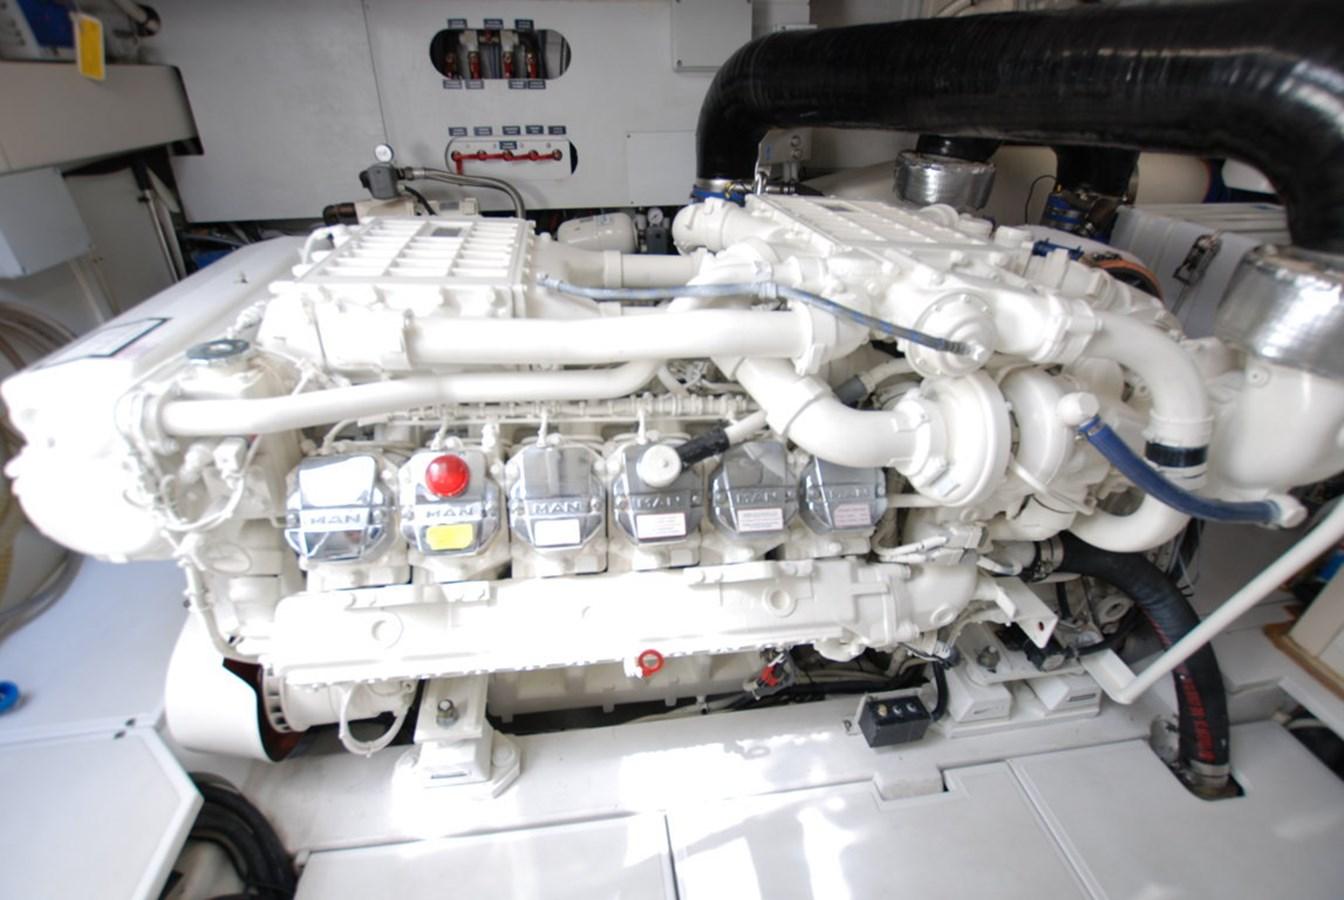 DSC_3955 (FILEminimizer) 2007 PERSHING 62 HT Motor Yacht 2756216